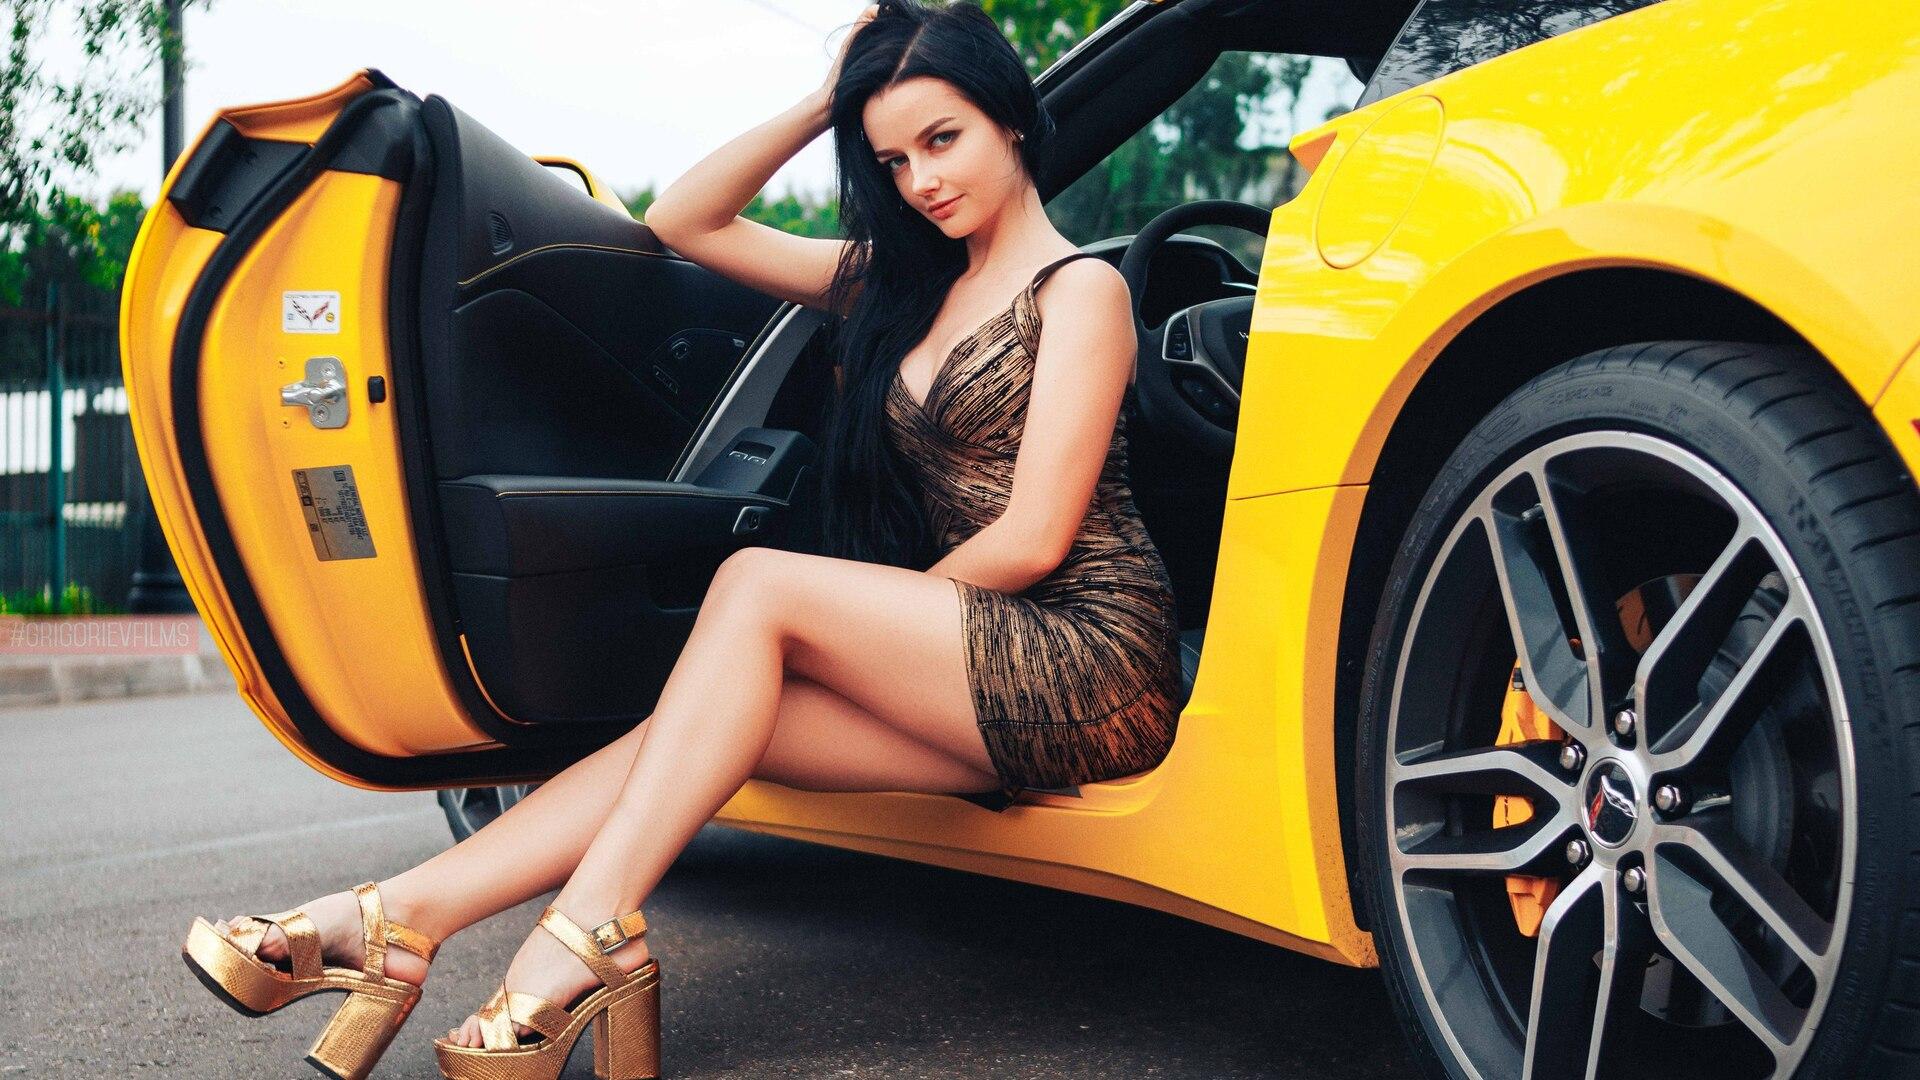 Pin by Vdubnchad on Ferrari Models 2 | Car girls, Girls in